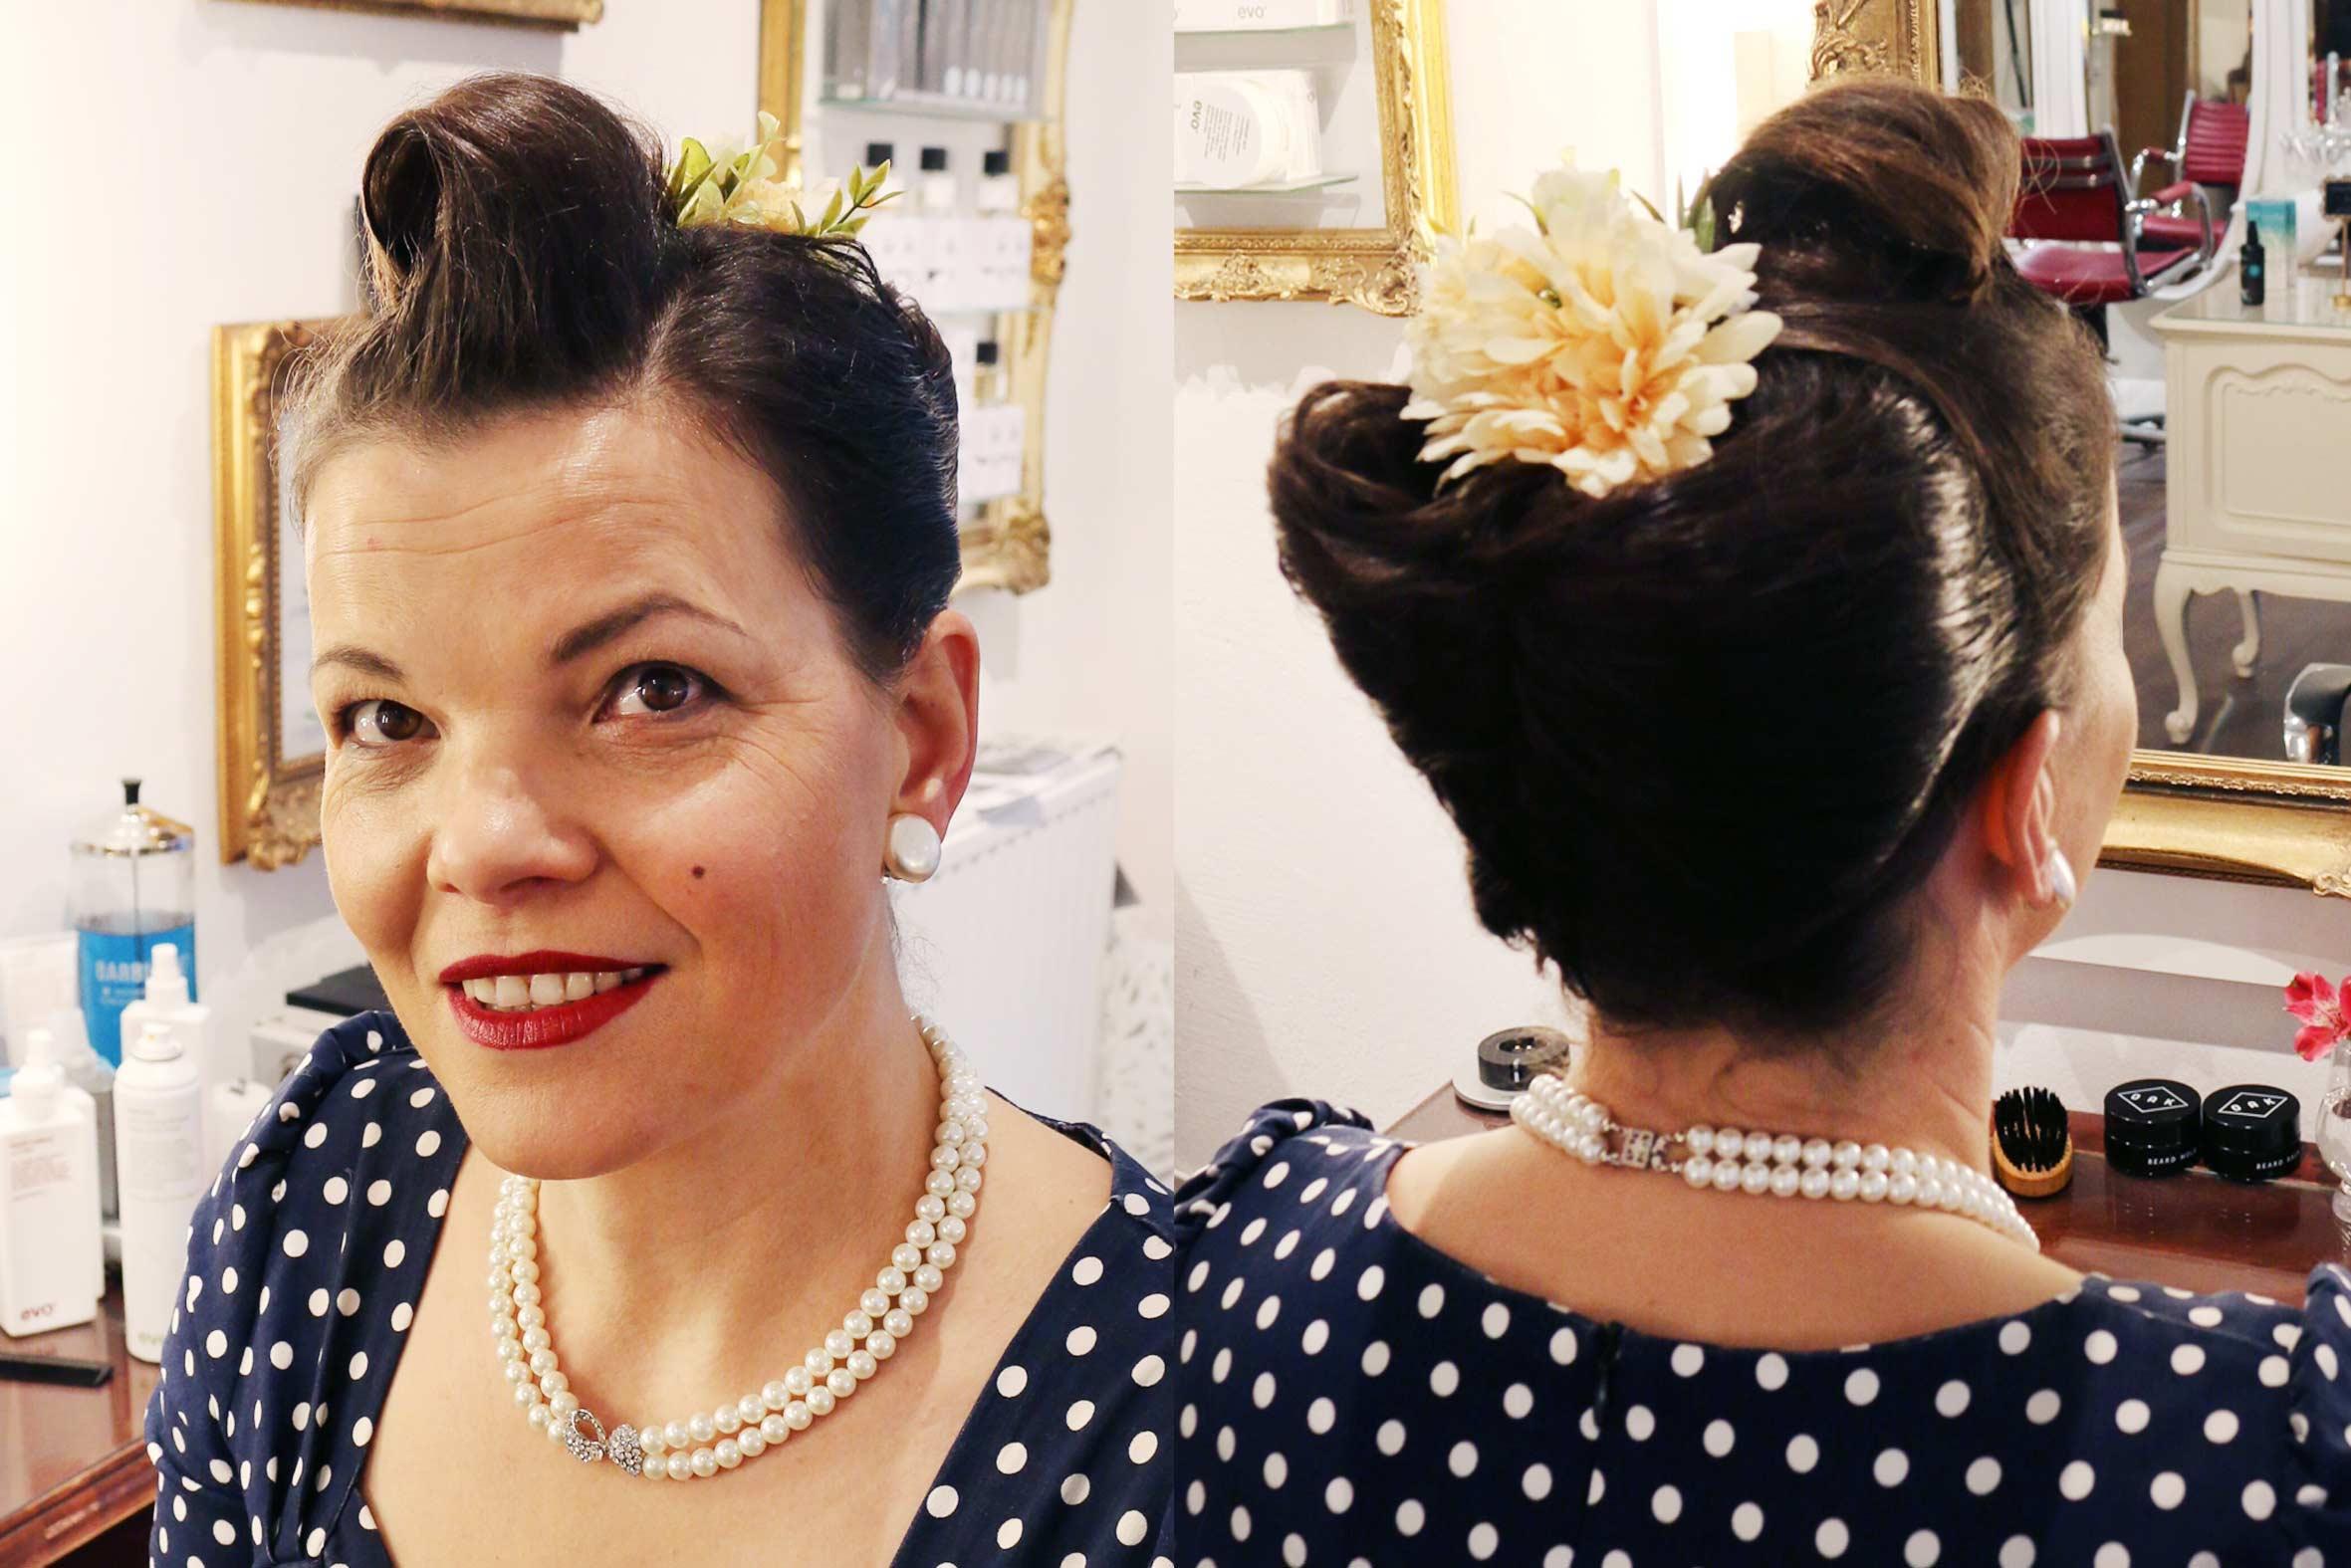 vintage hairstyling 50er jahre victory rolls püppikram